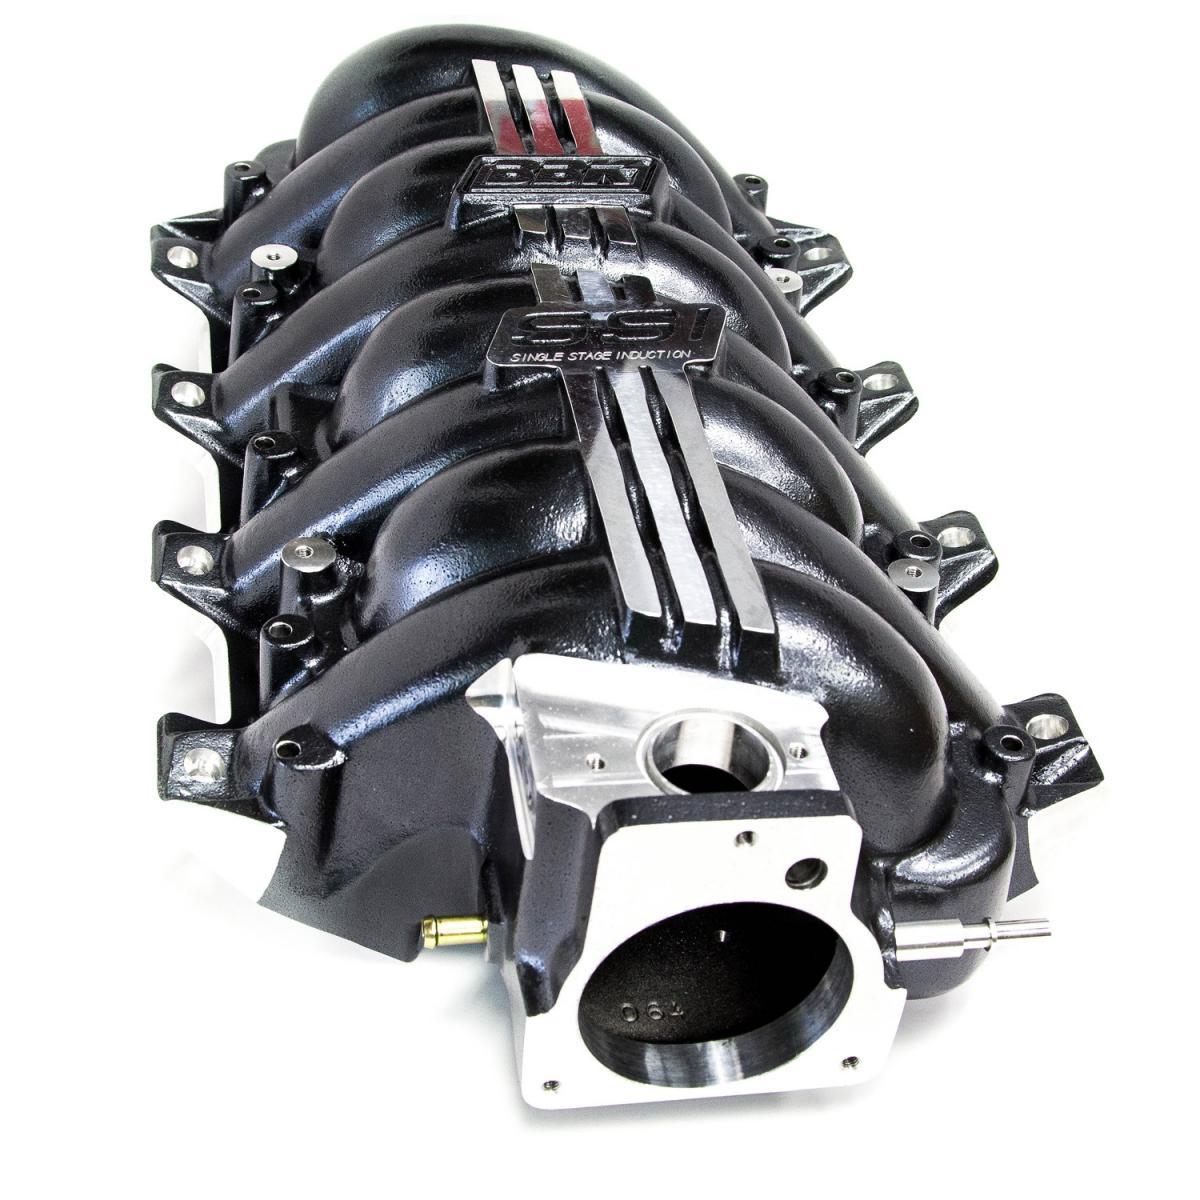 Best Ls1 Engine Upgrades: Intake Manifolds, LS6, LS1, LS2, LS3, FAST, Ported, Custom